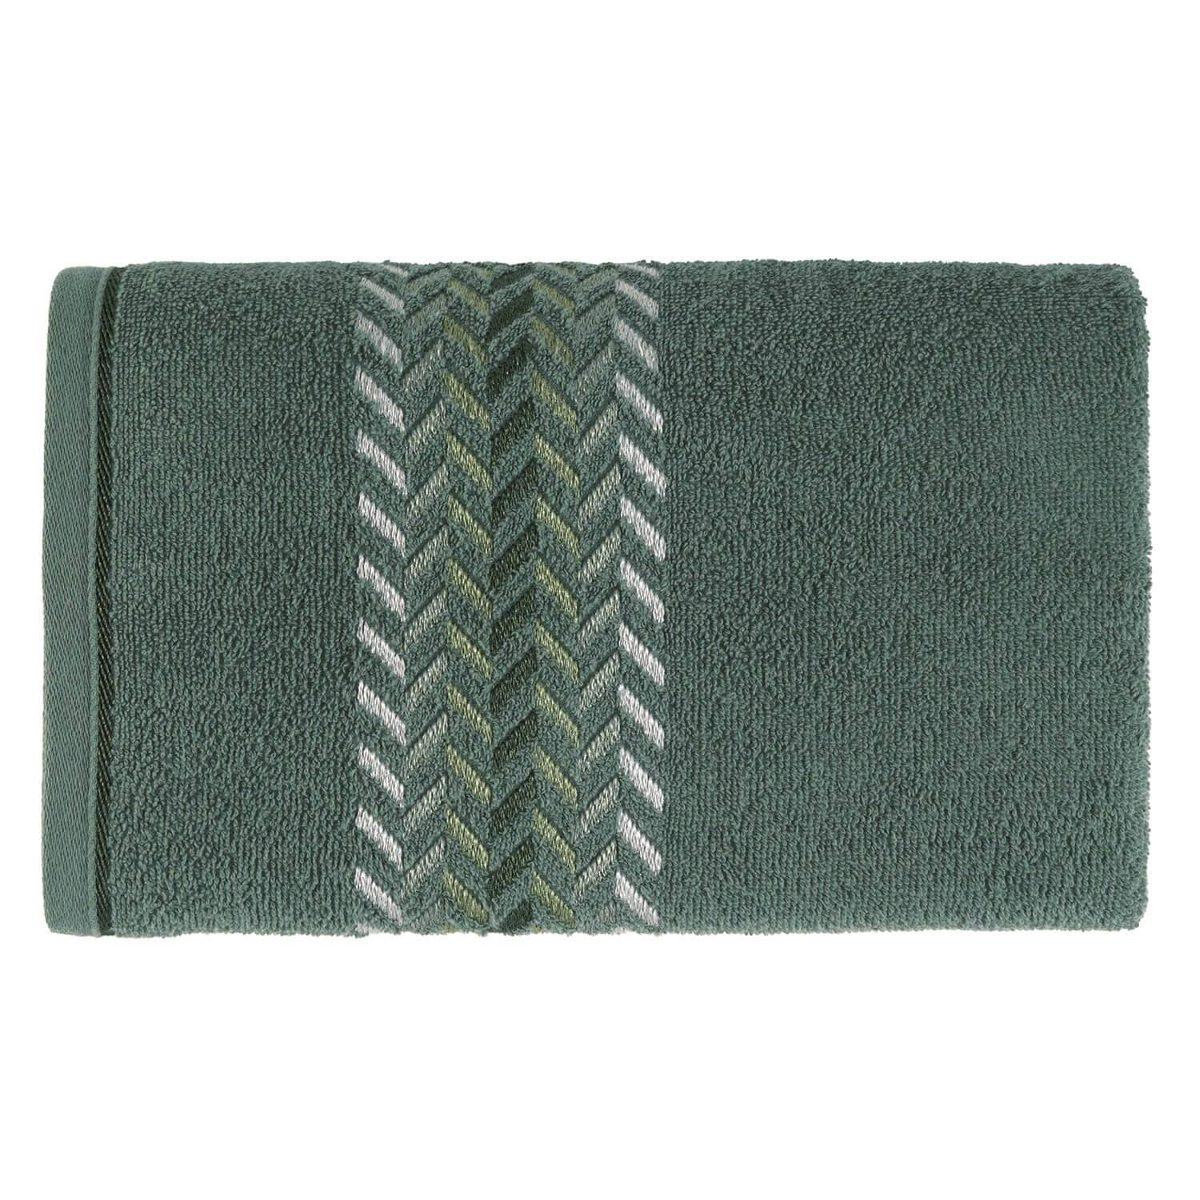 07f6b2679 Toalha Karsten Softmax Jhonson Banho 70 X 135 Cm Verde Bonsa - R  50 ...